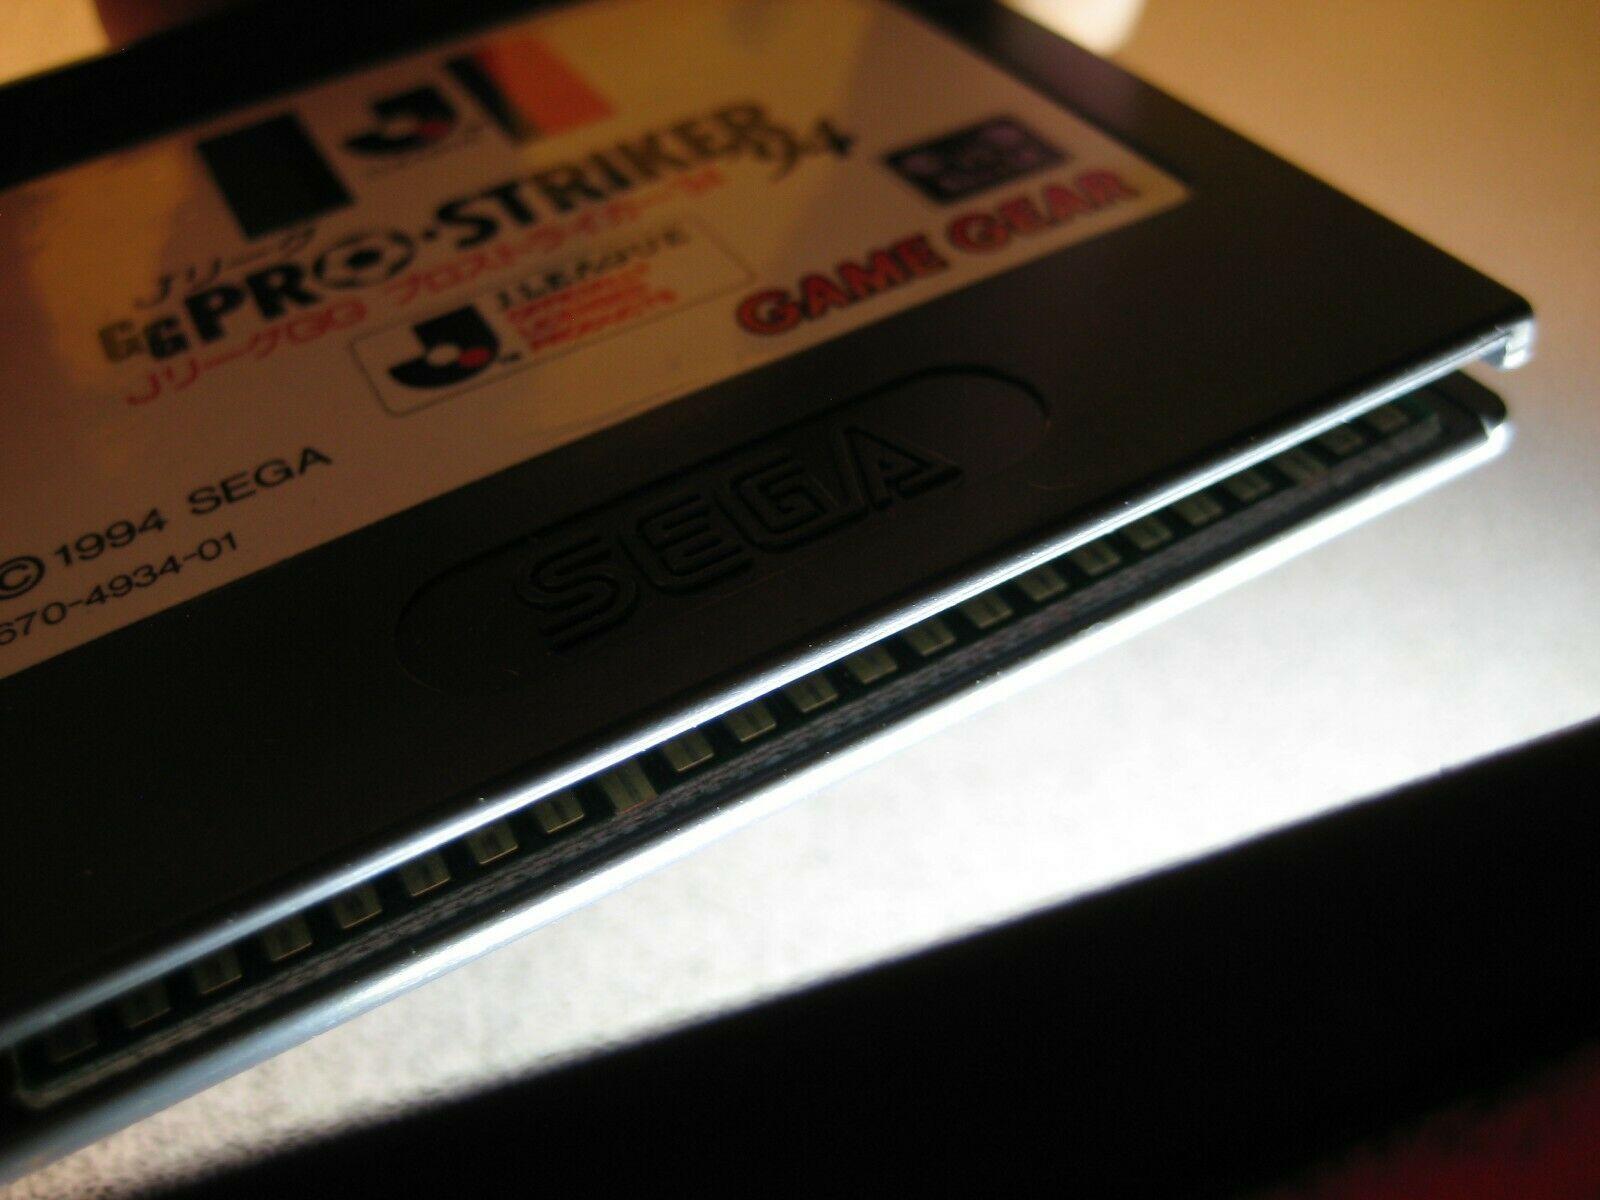 J.League GG Pro Striker 94 Sega Game Gear Cartridge with Case Soccer Football image 2